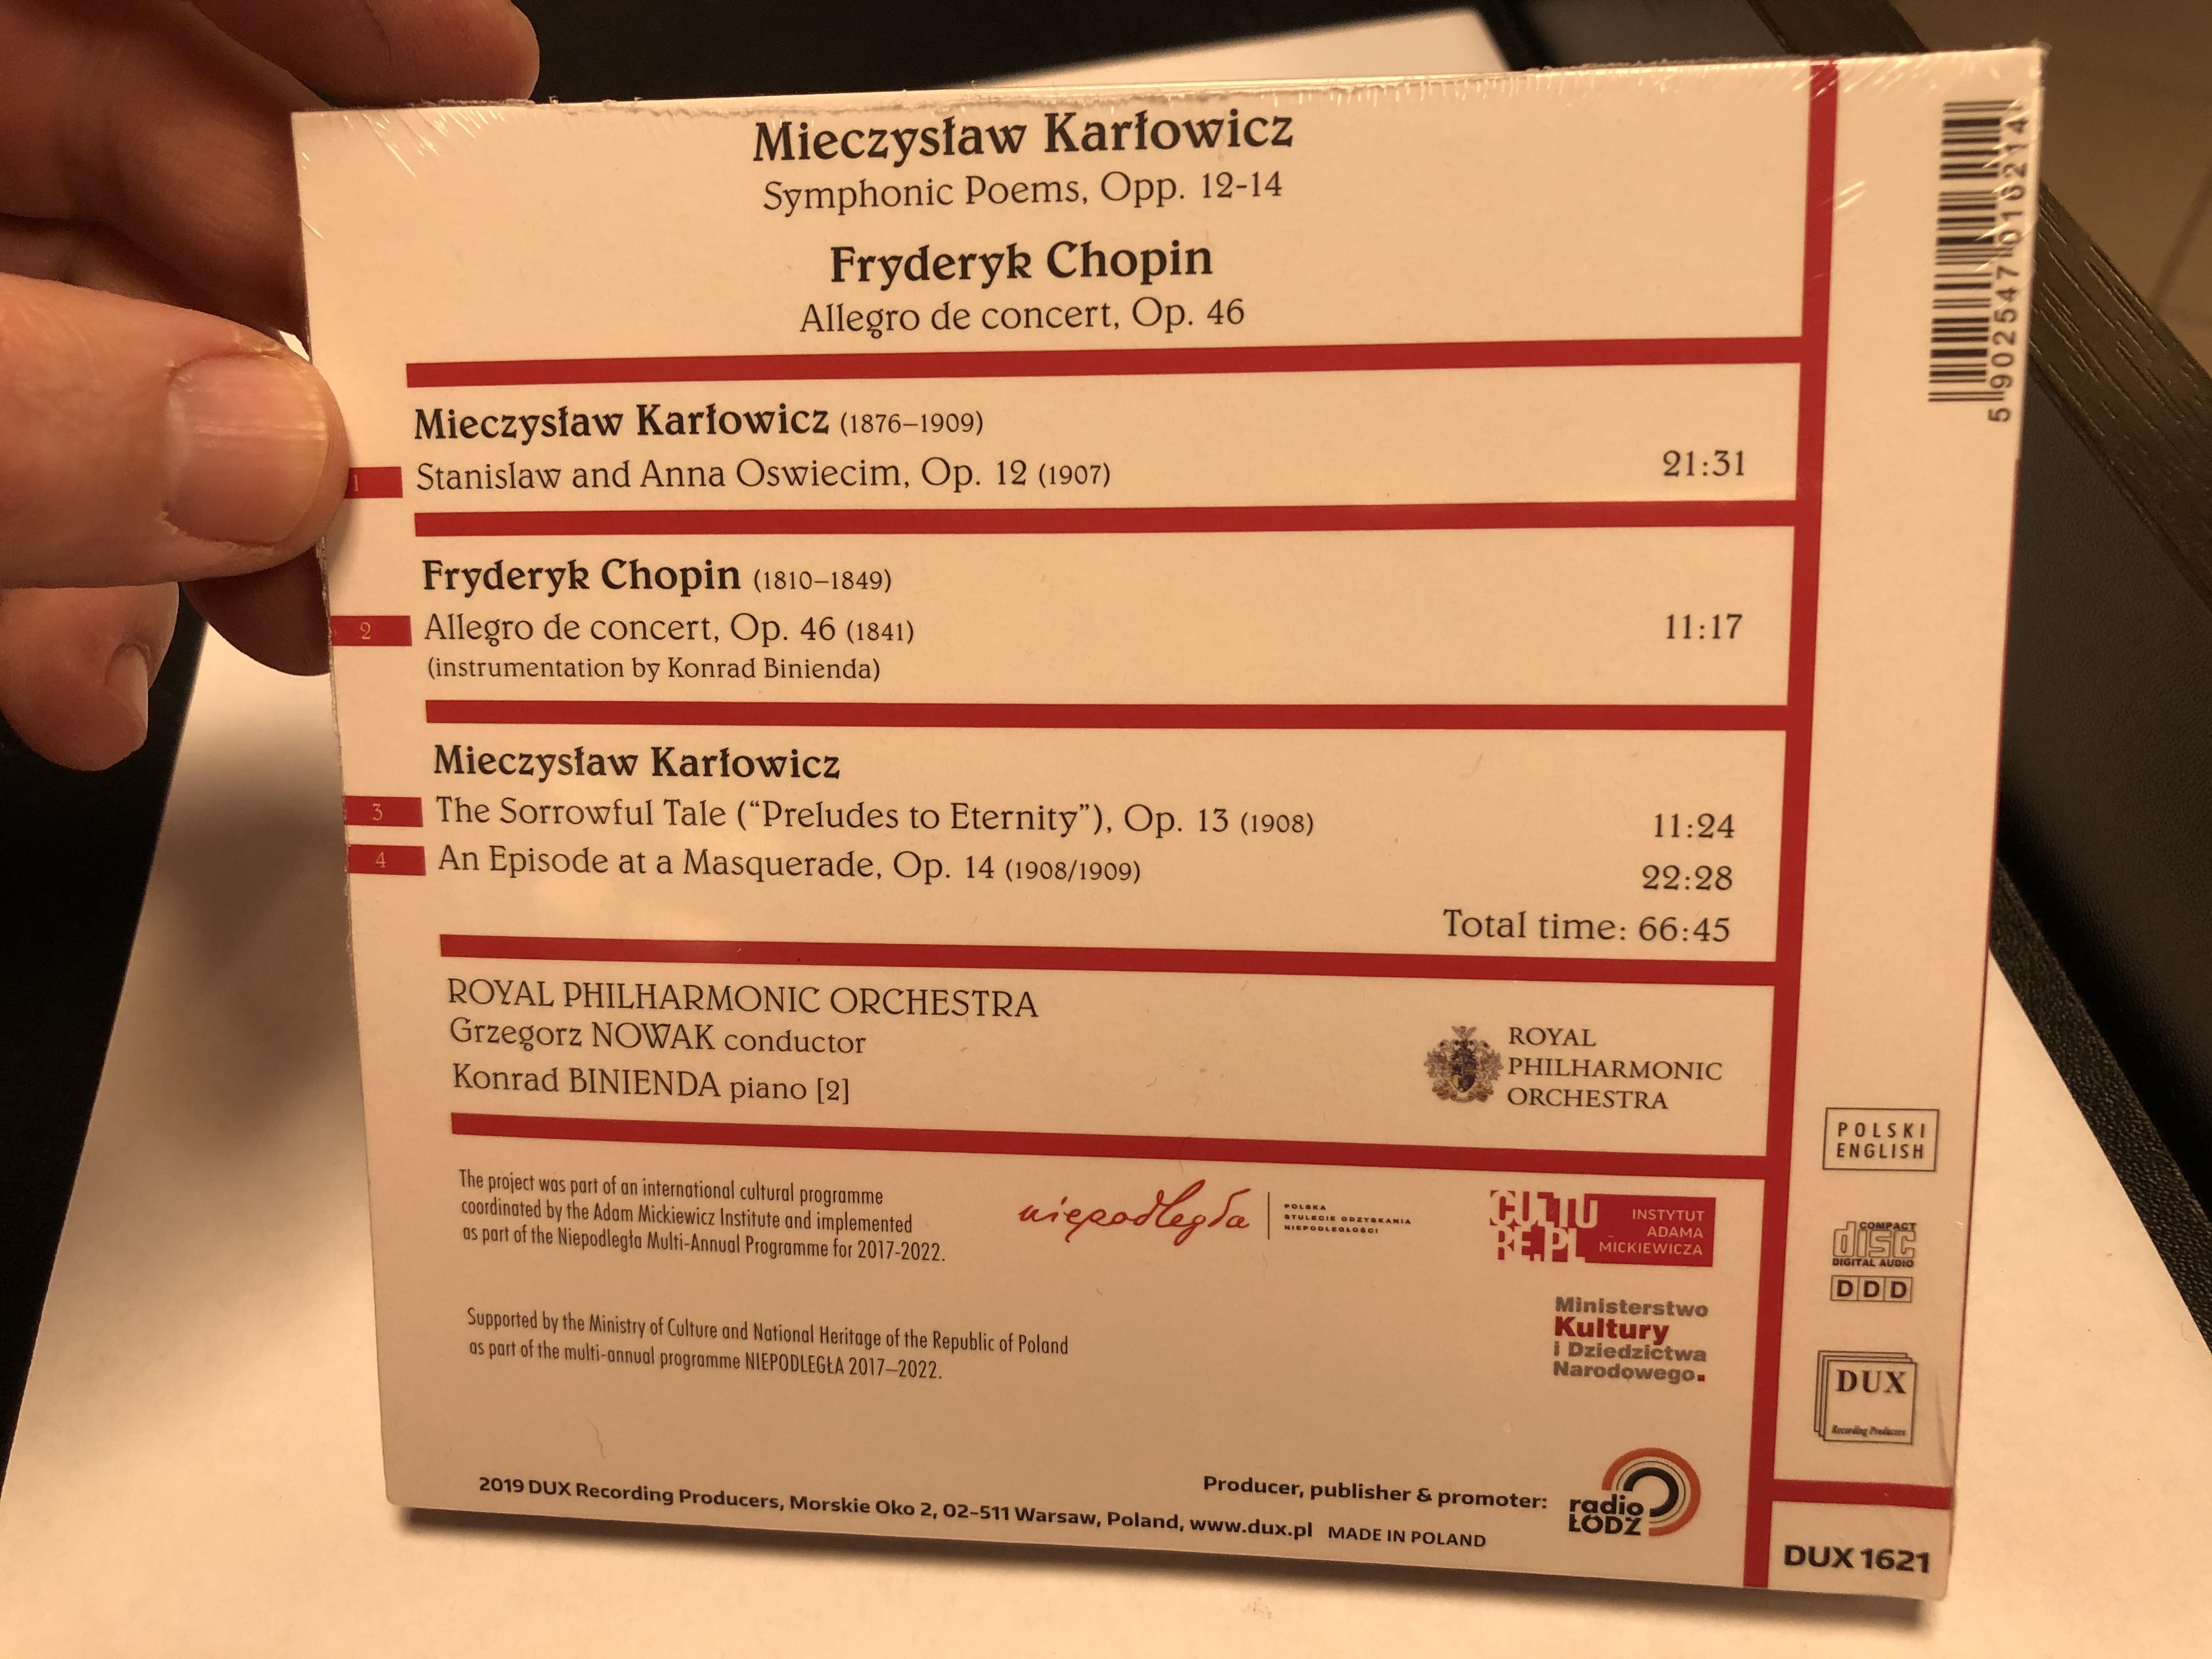 mieczyslaw-karlowicz-symphonic-poems-fryderyk-chopin-allegro-de-concert-royal-philharmonic-orchestra-grzegorz-nowak-conductor-konrad-binienda-piano-dux-recording-audio-cd-2019-.jpg